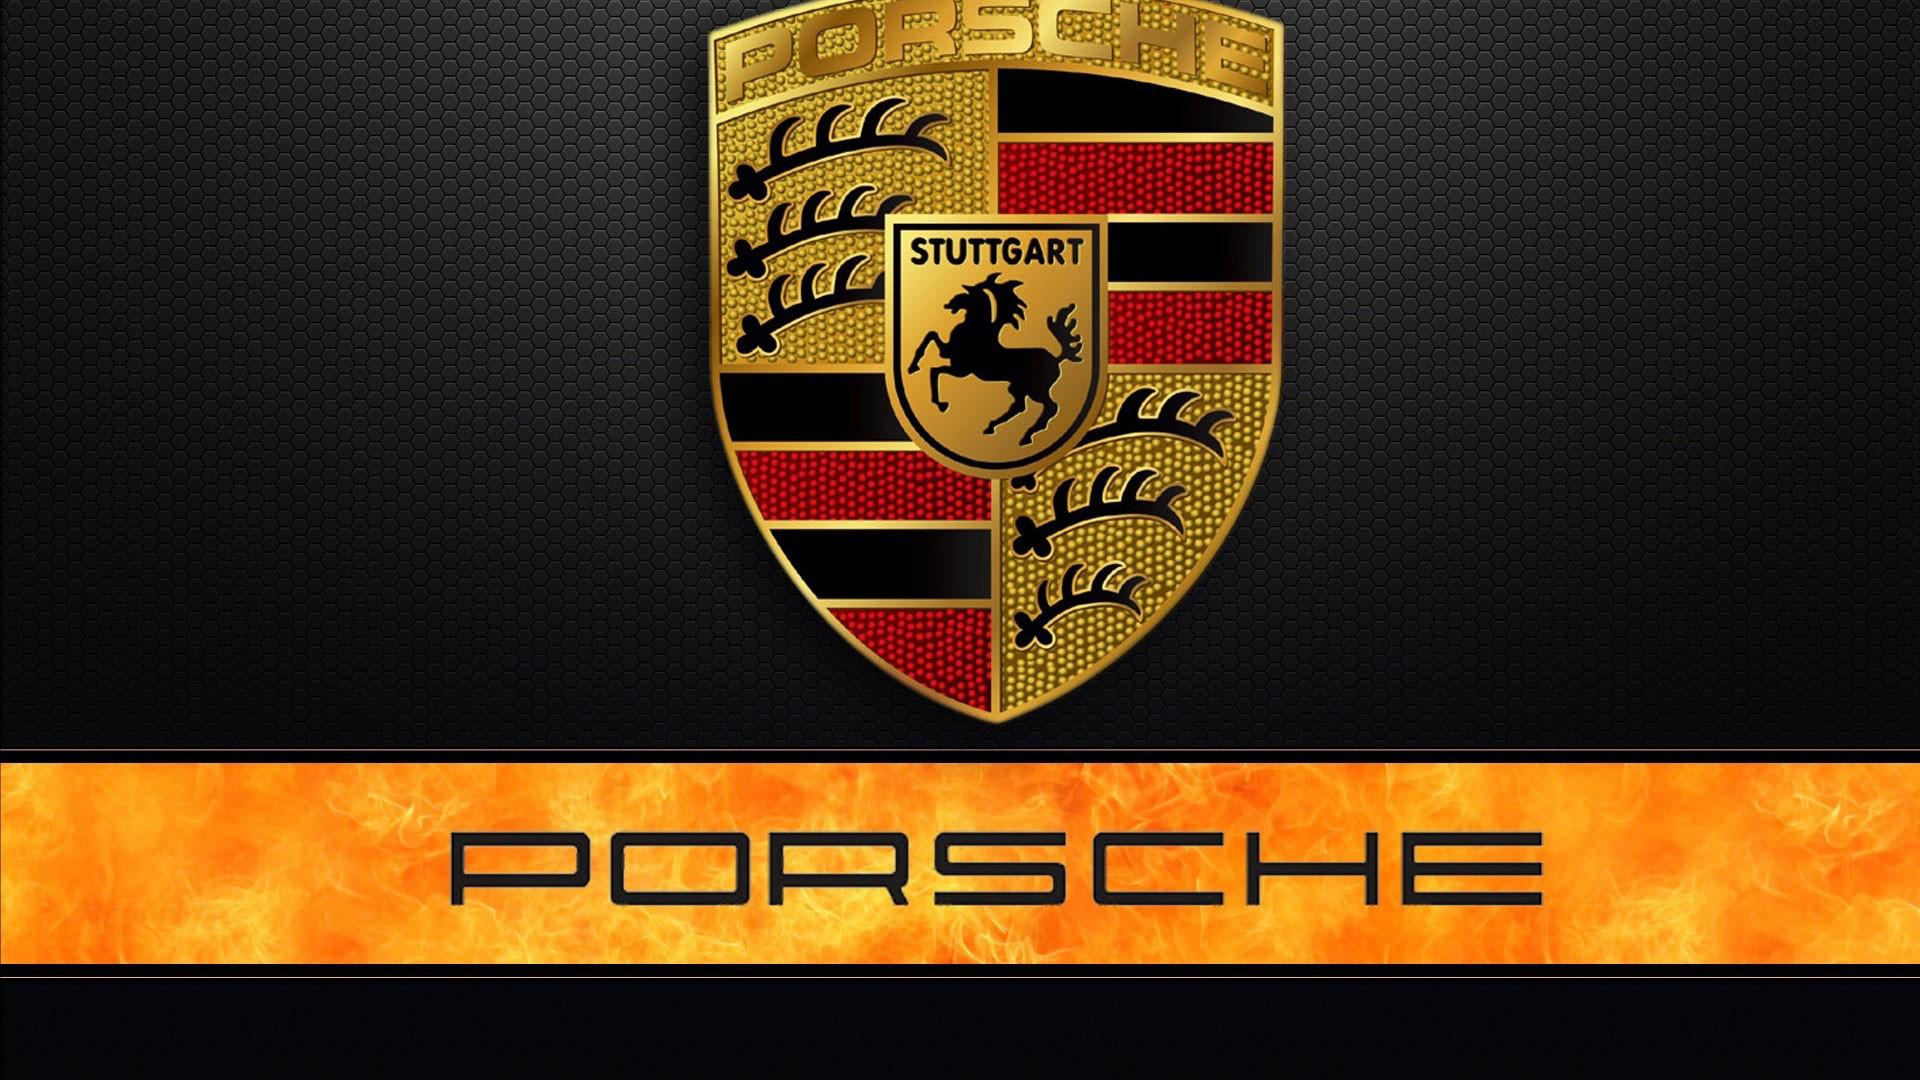 L 1920x1080 Hd Pics Photos Cars Porsche Logo Desktop Background Wallpaper